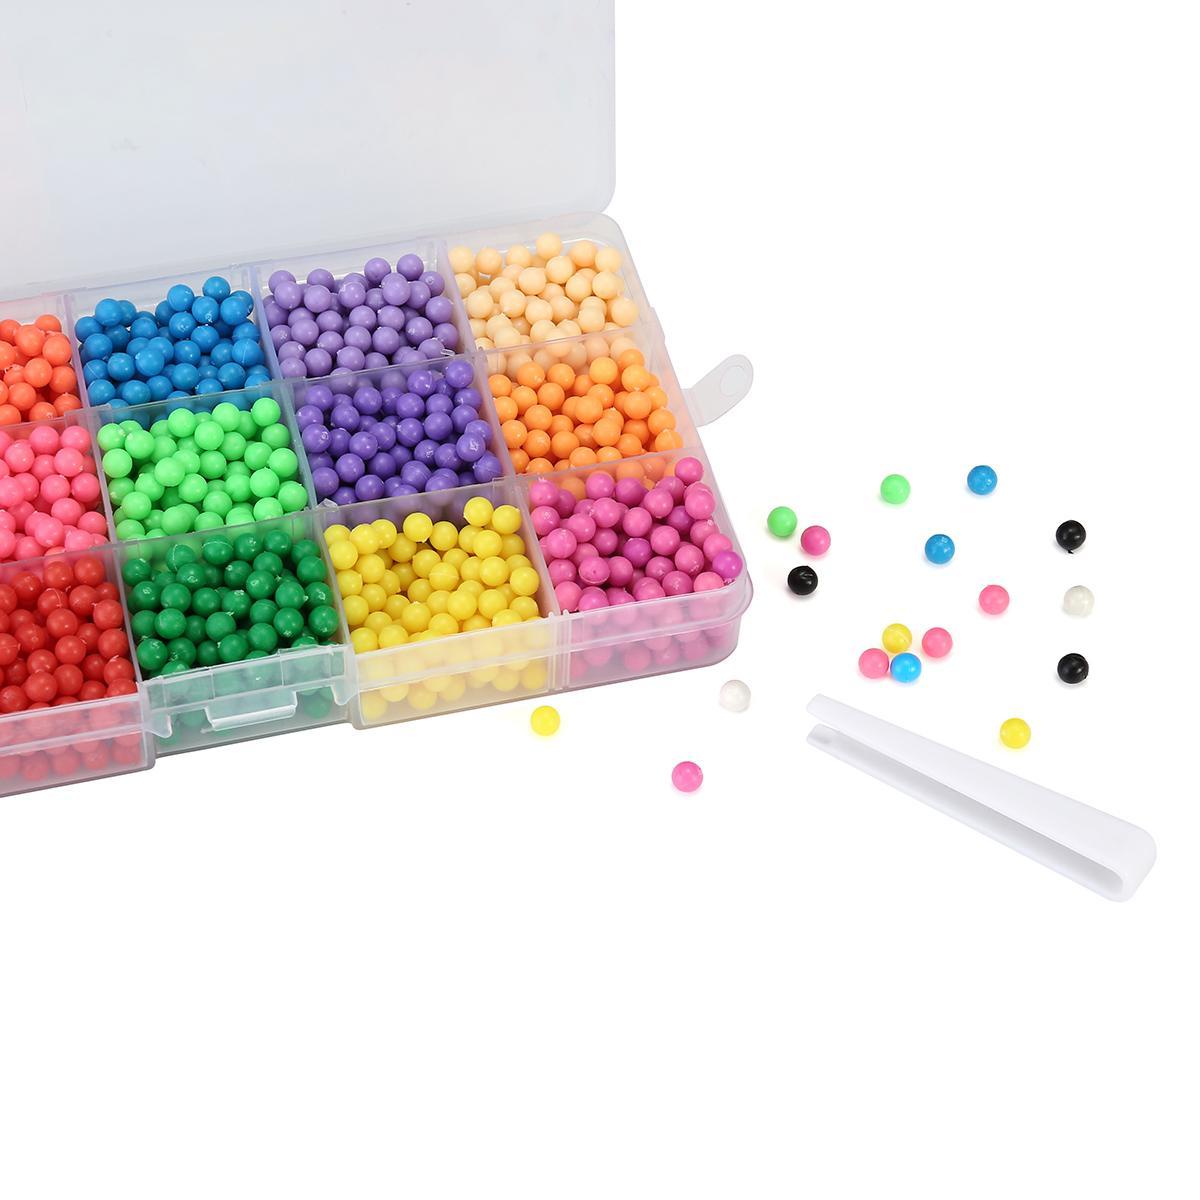 Blesiya Magic Aqua Beads Handmade 3D Puzzle Educational Toy Kid Gifts